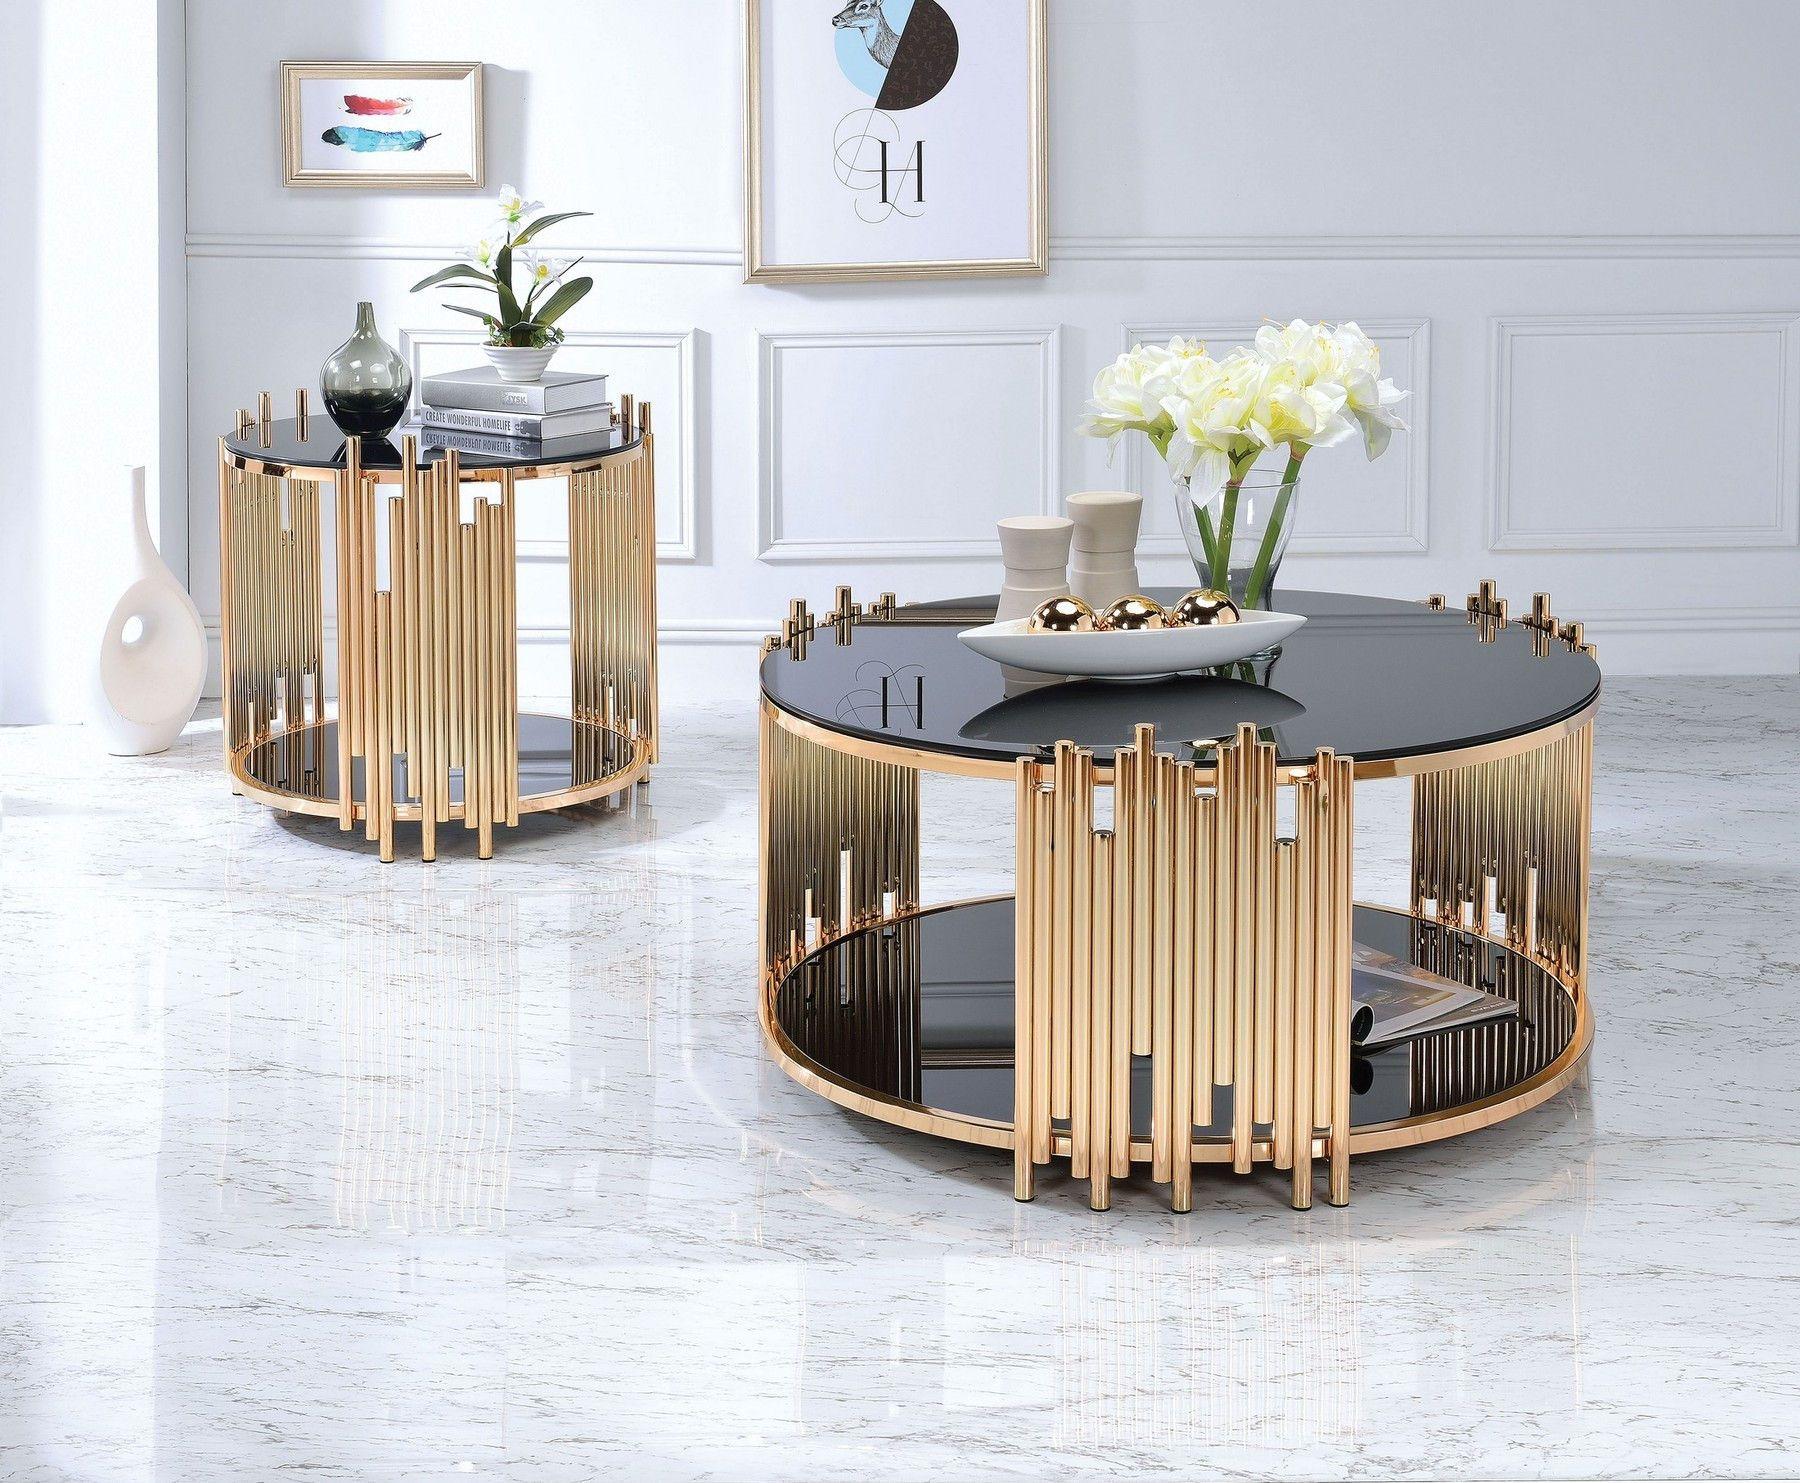 Eulalia Light Teal Sofa 54145 84490 Acme Corporation Fabric Sofas Living Room Table Sets Table Decor Living Room Coffee Table [ 1483 x 1800 Pixel ]